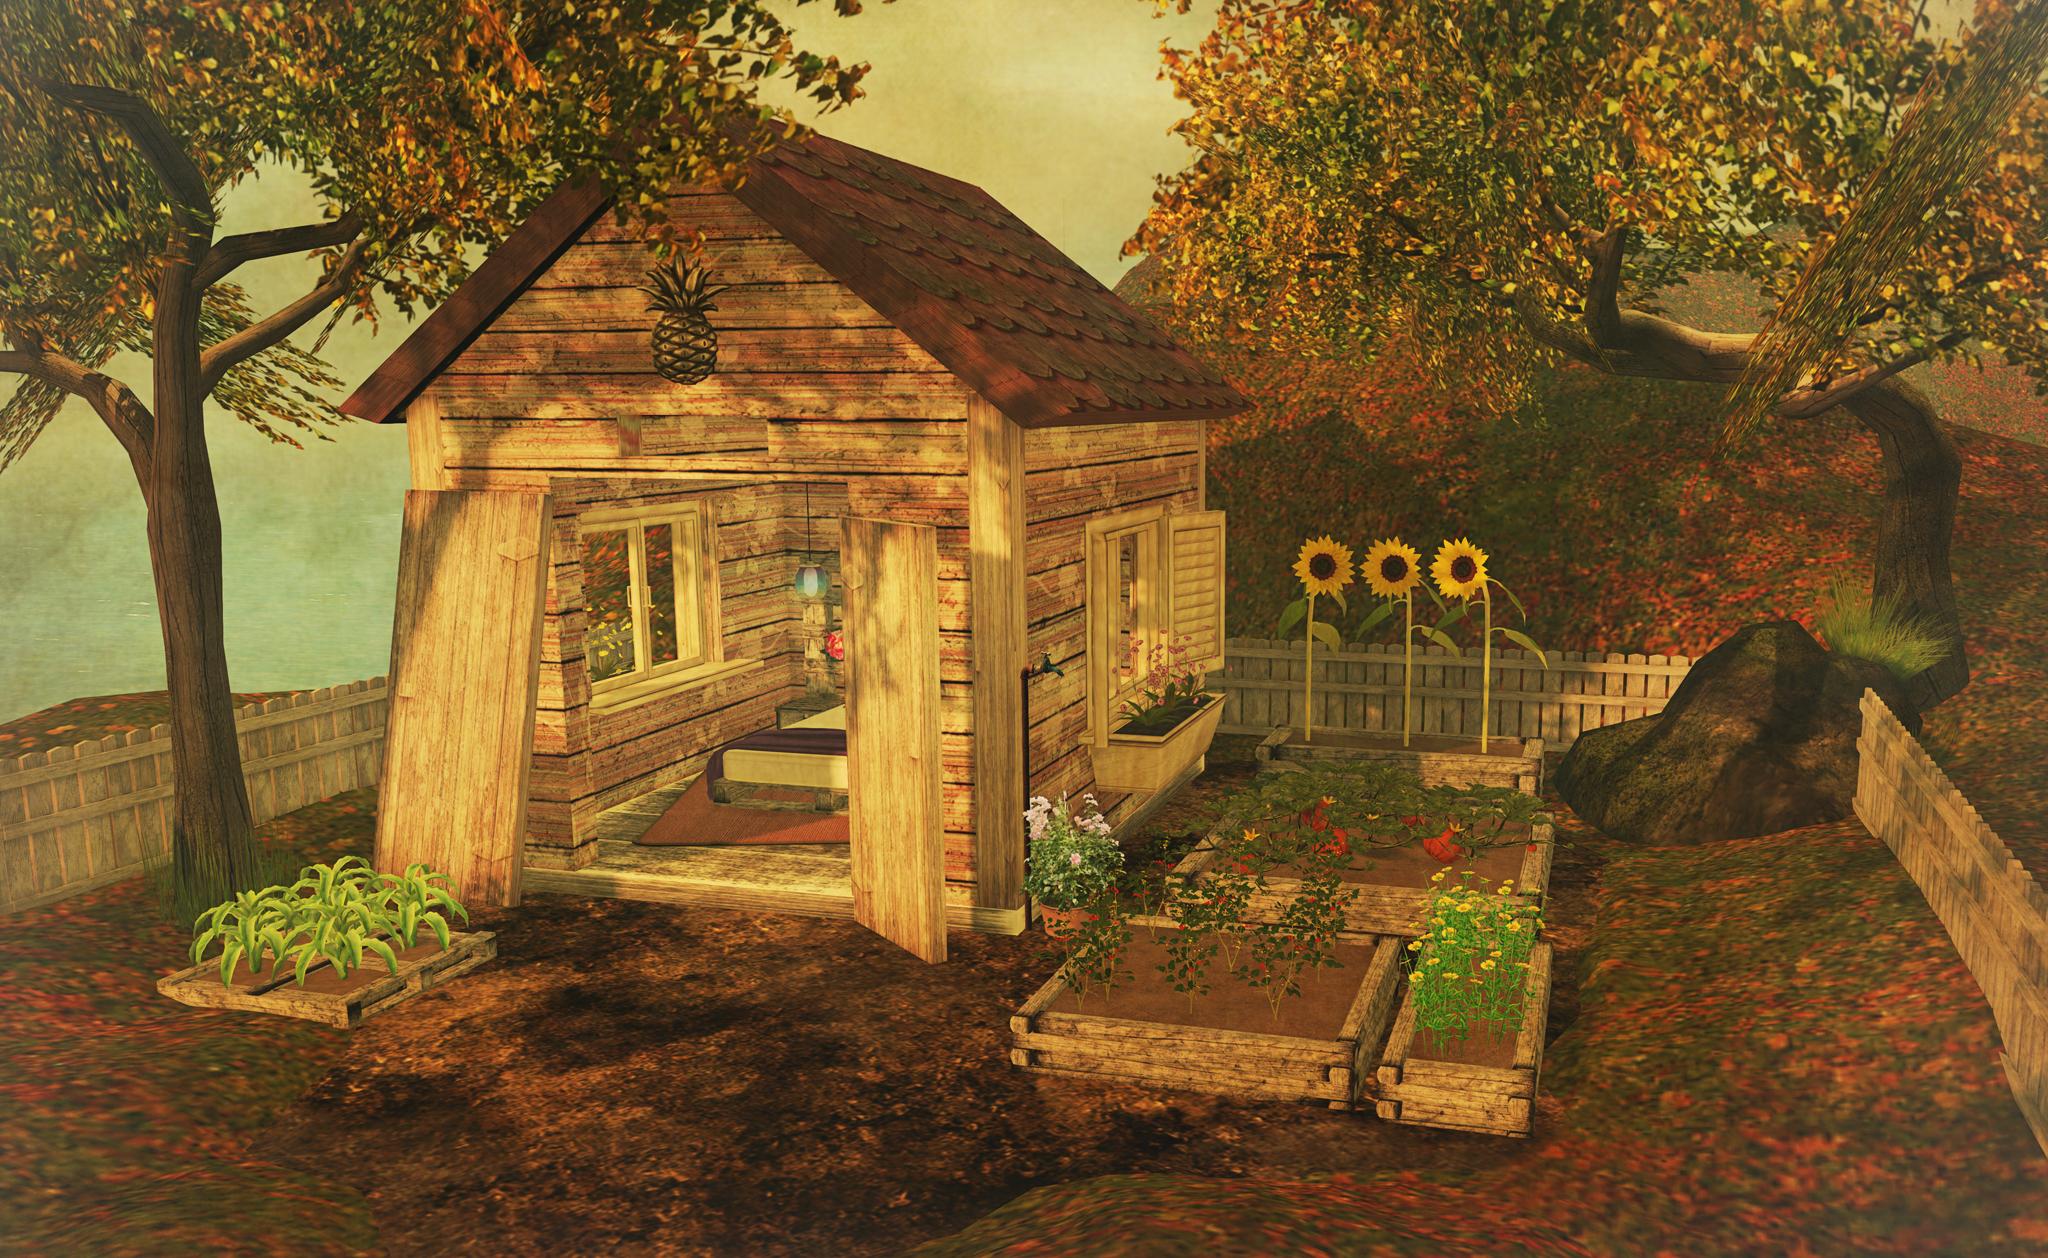 home design expo 55307867n03 hge1 2048 - Expo Home Design